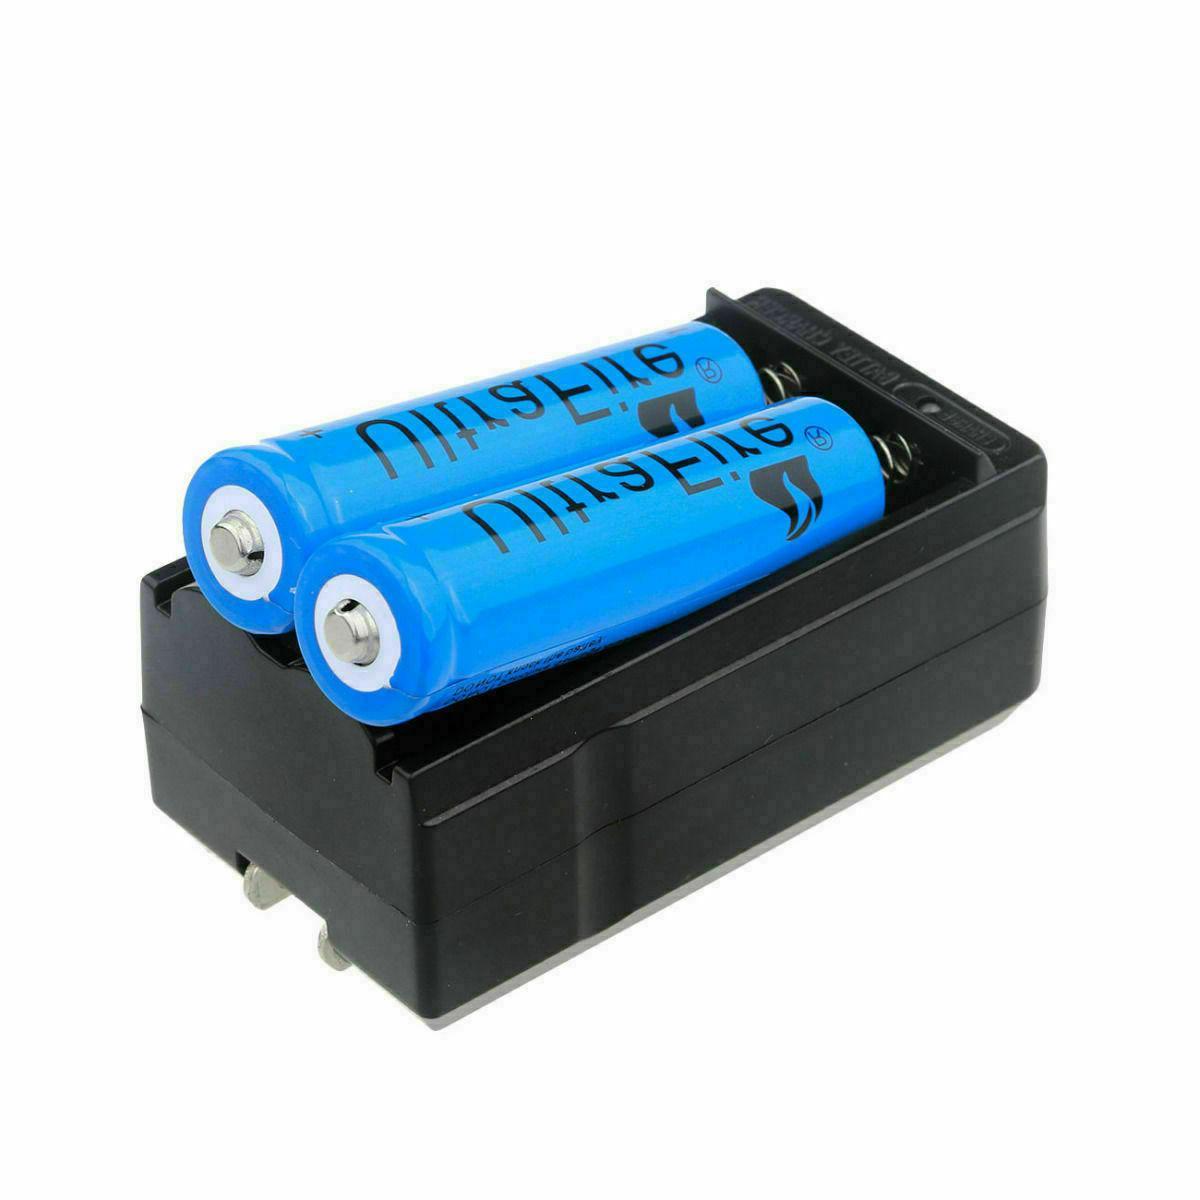 18650 Battery 3.7V Rechargeable LED Flashlight Head